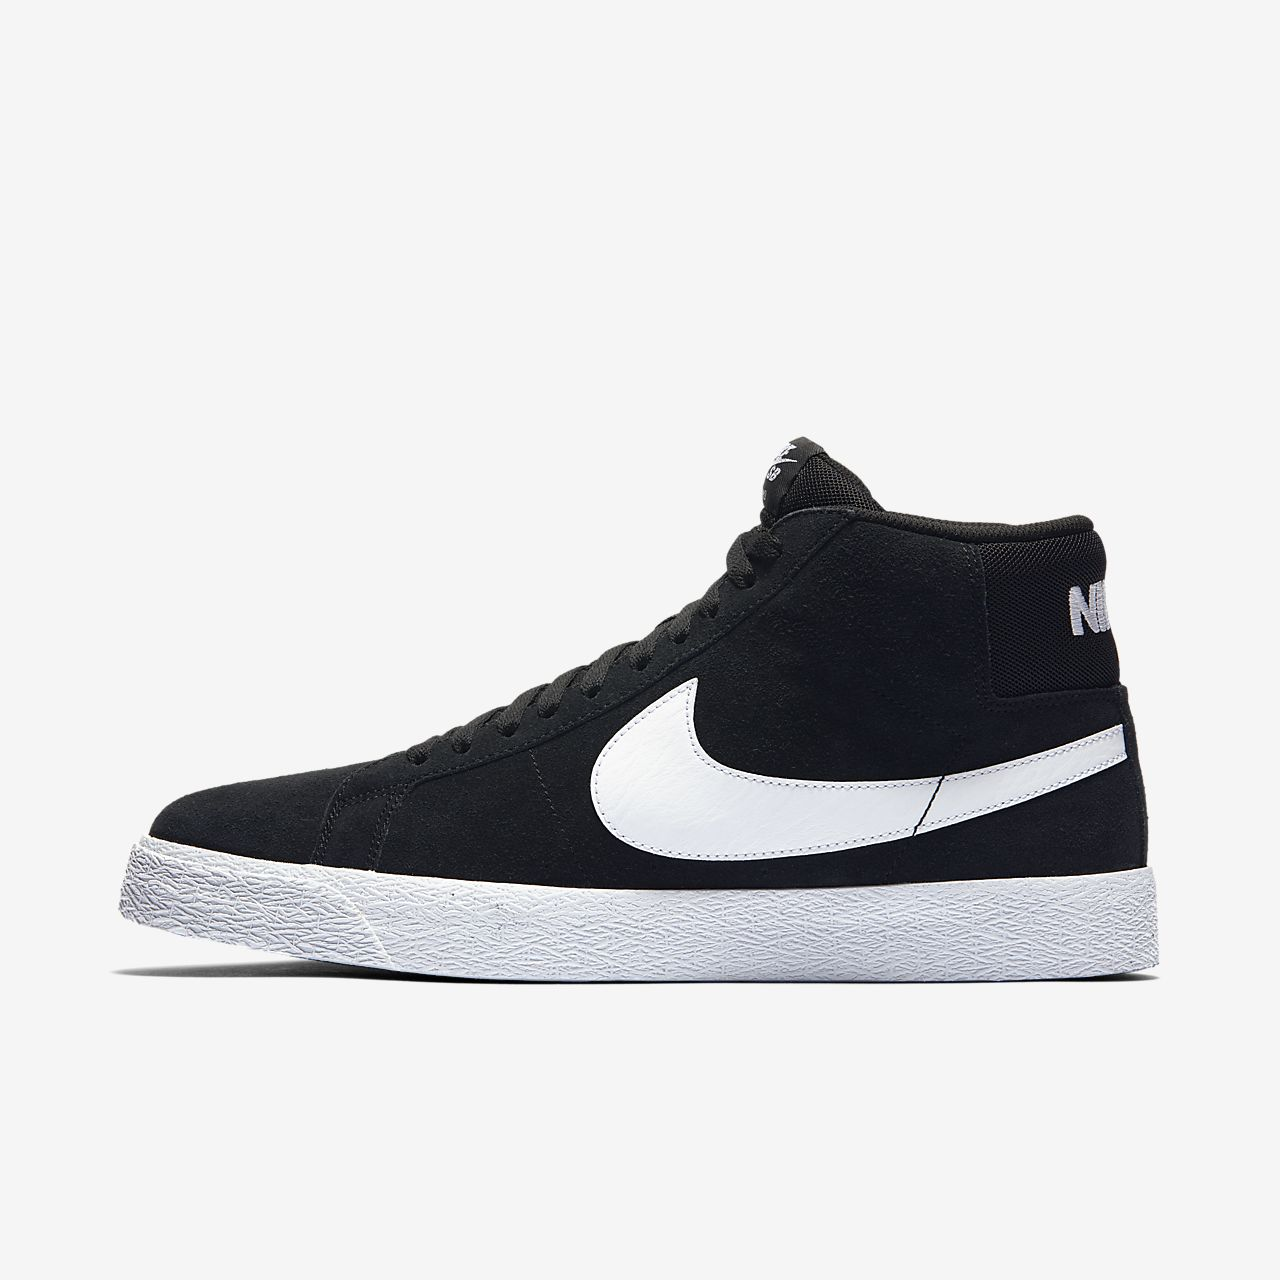 ... Nike SB Blazer Mid Men's Skateboarding Shoe